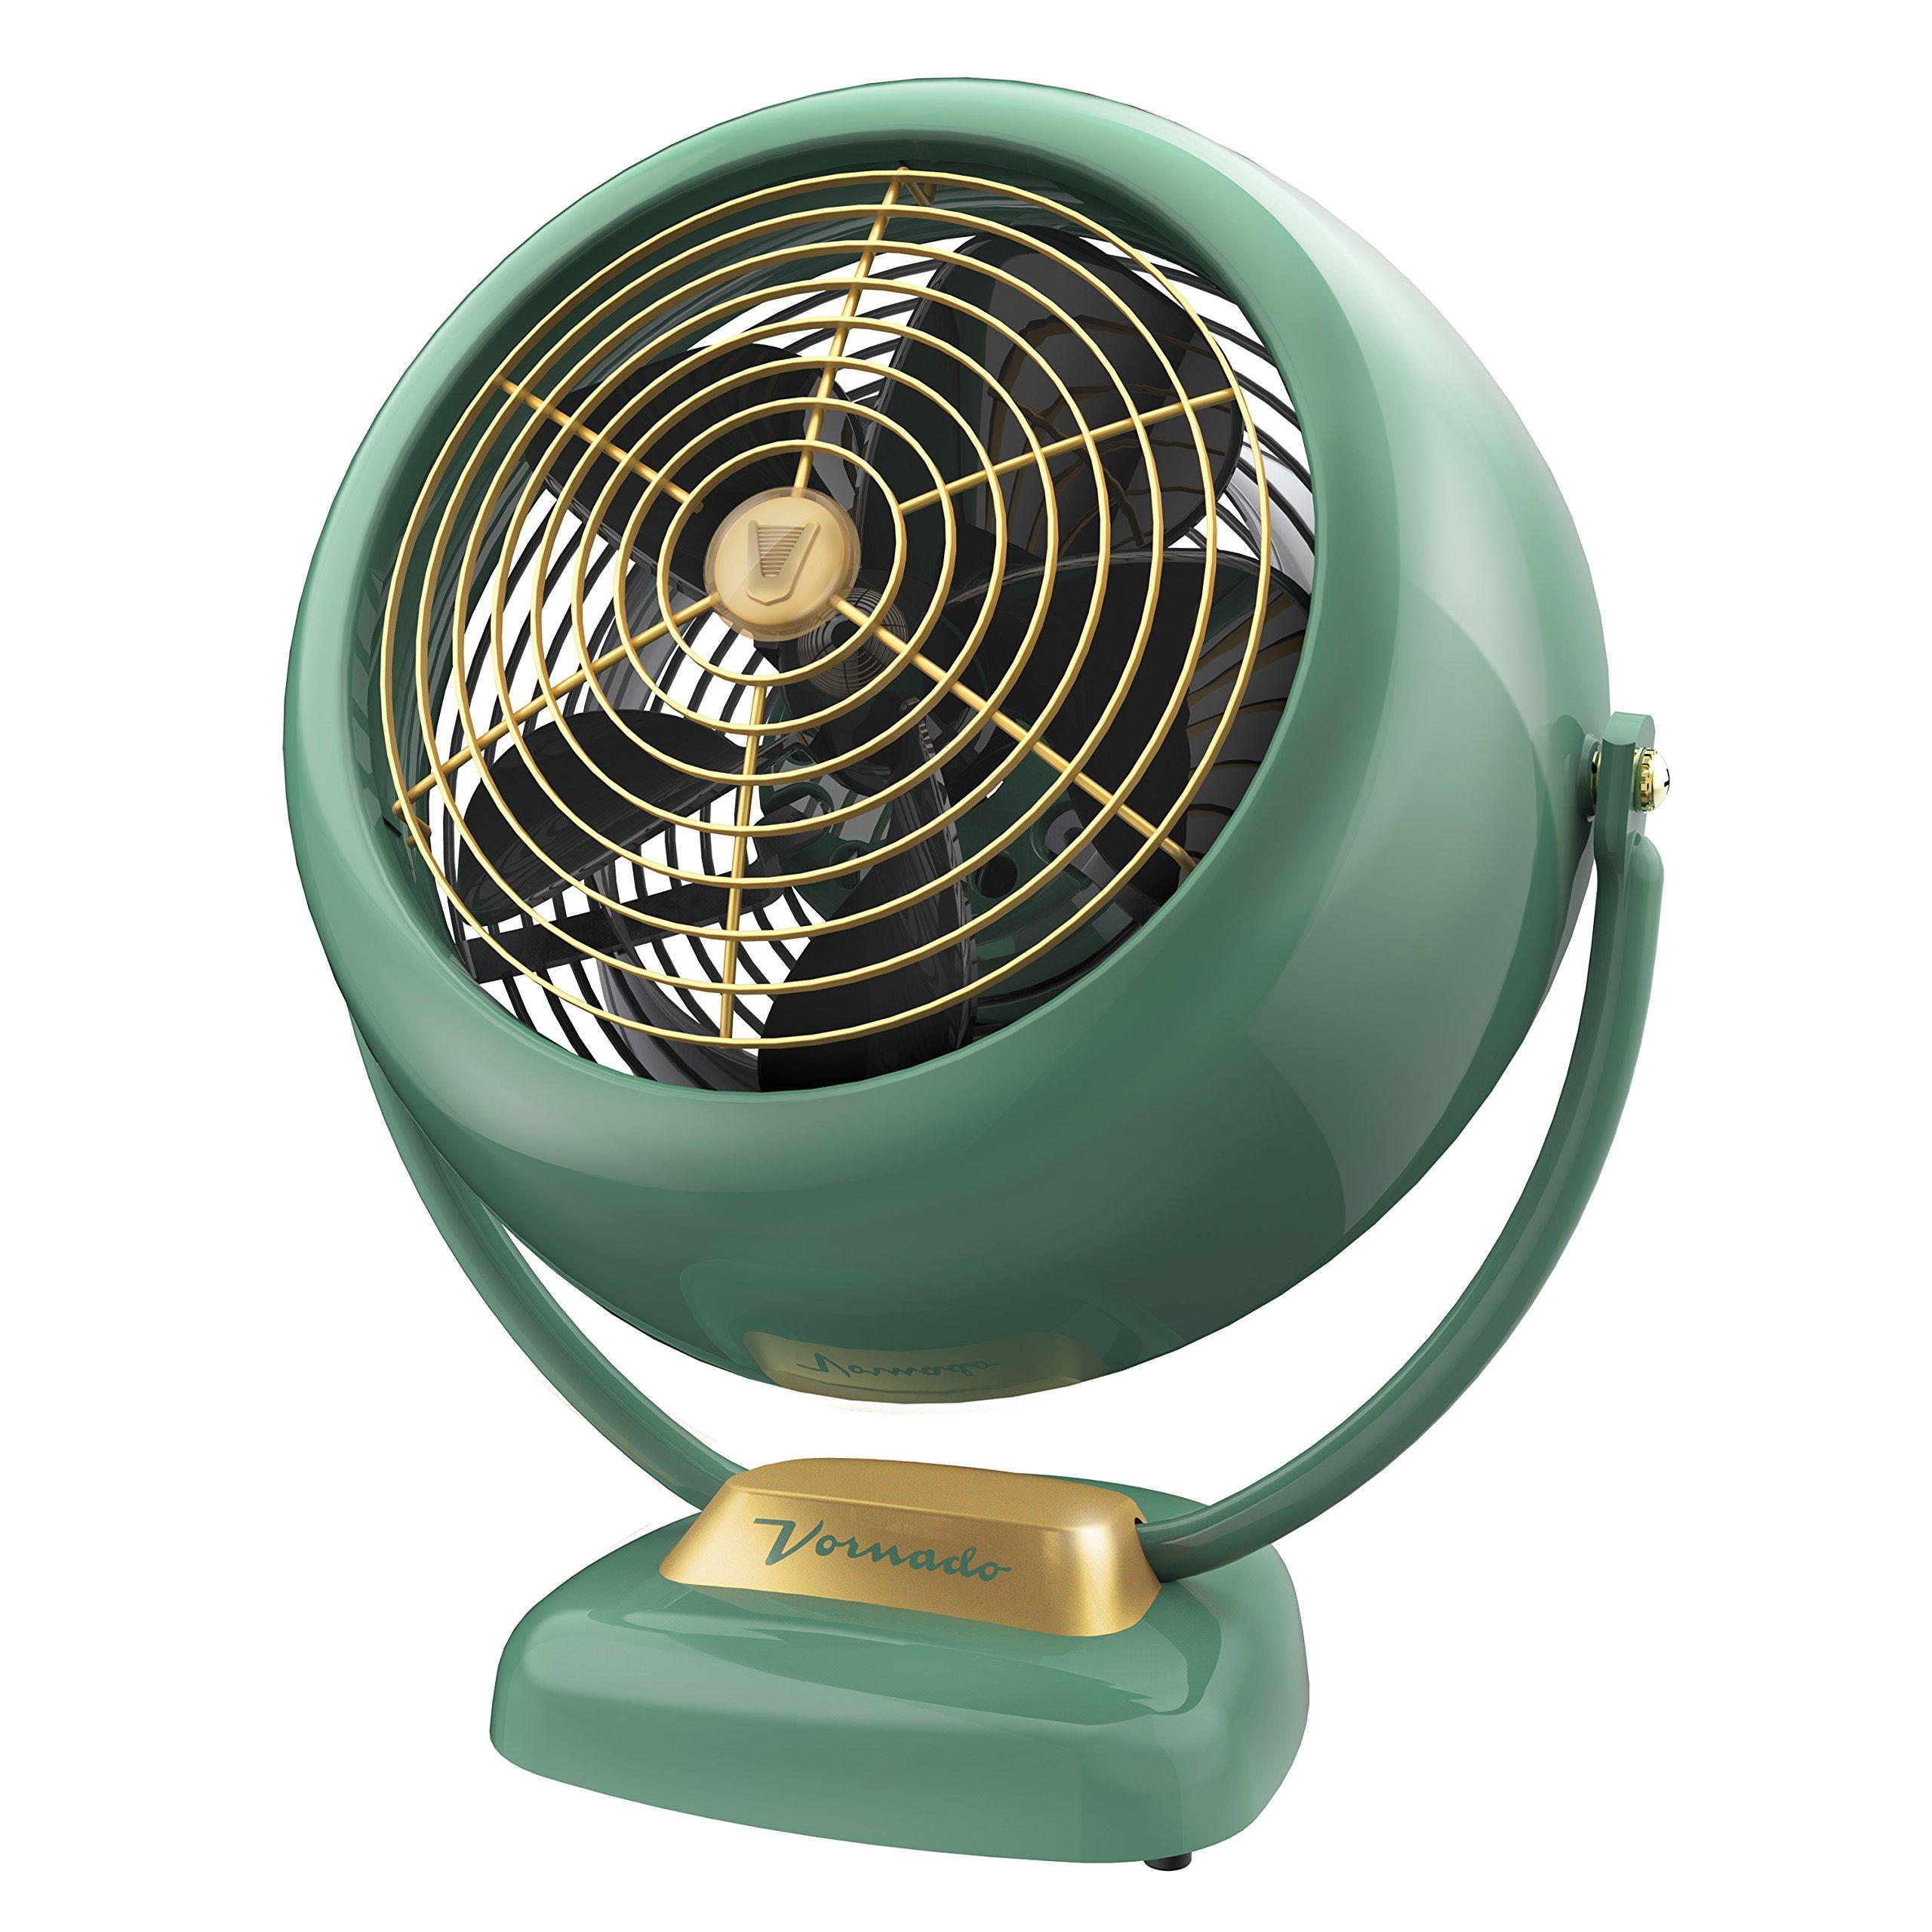 Vornado VFAN Sr. Vintage Air Circulator Fan, Green